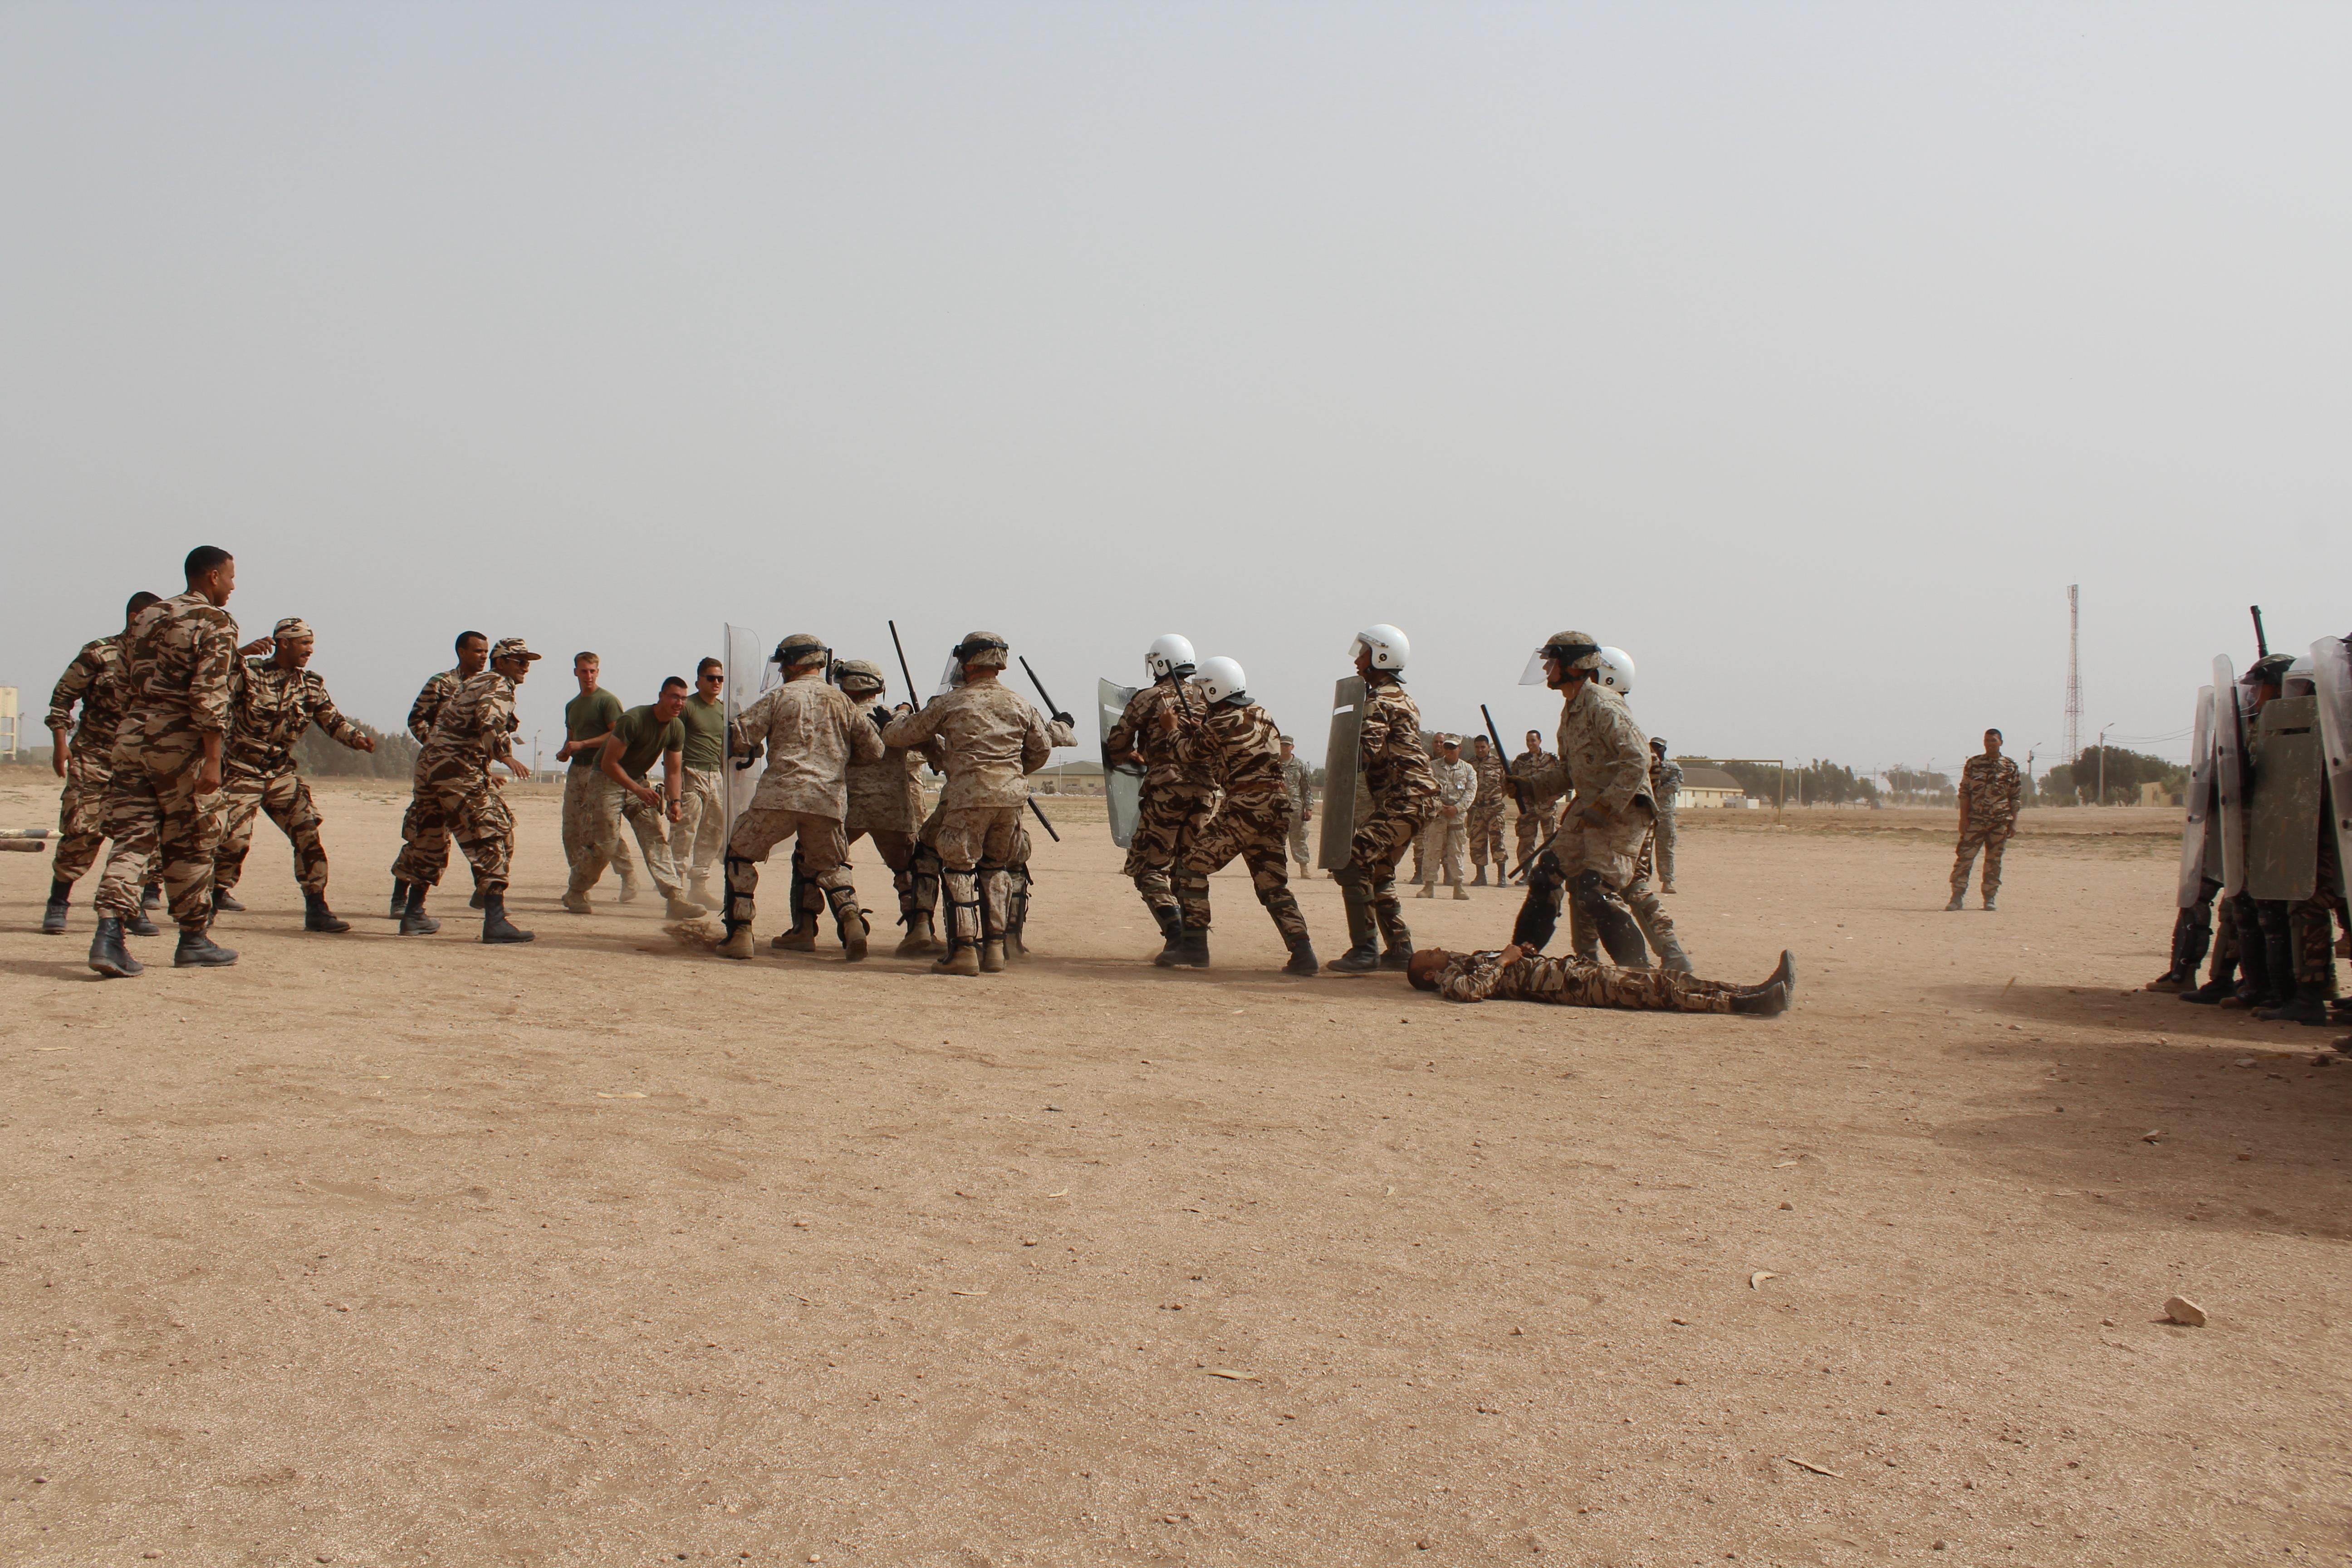 Owa Cac Military